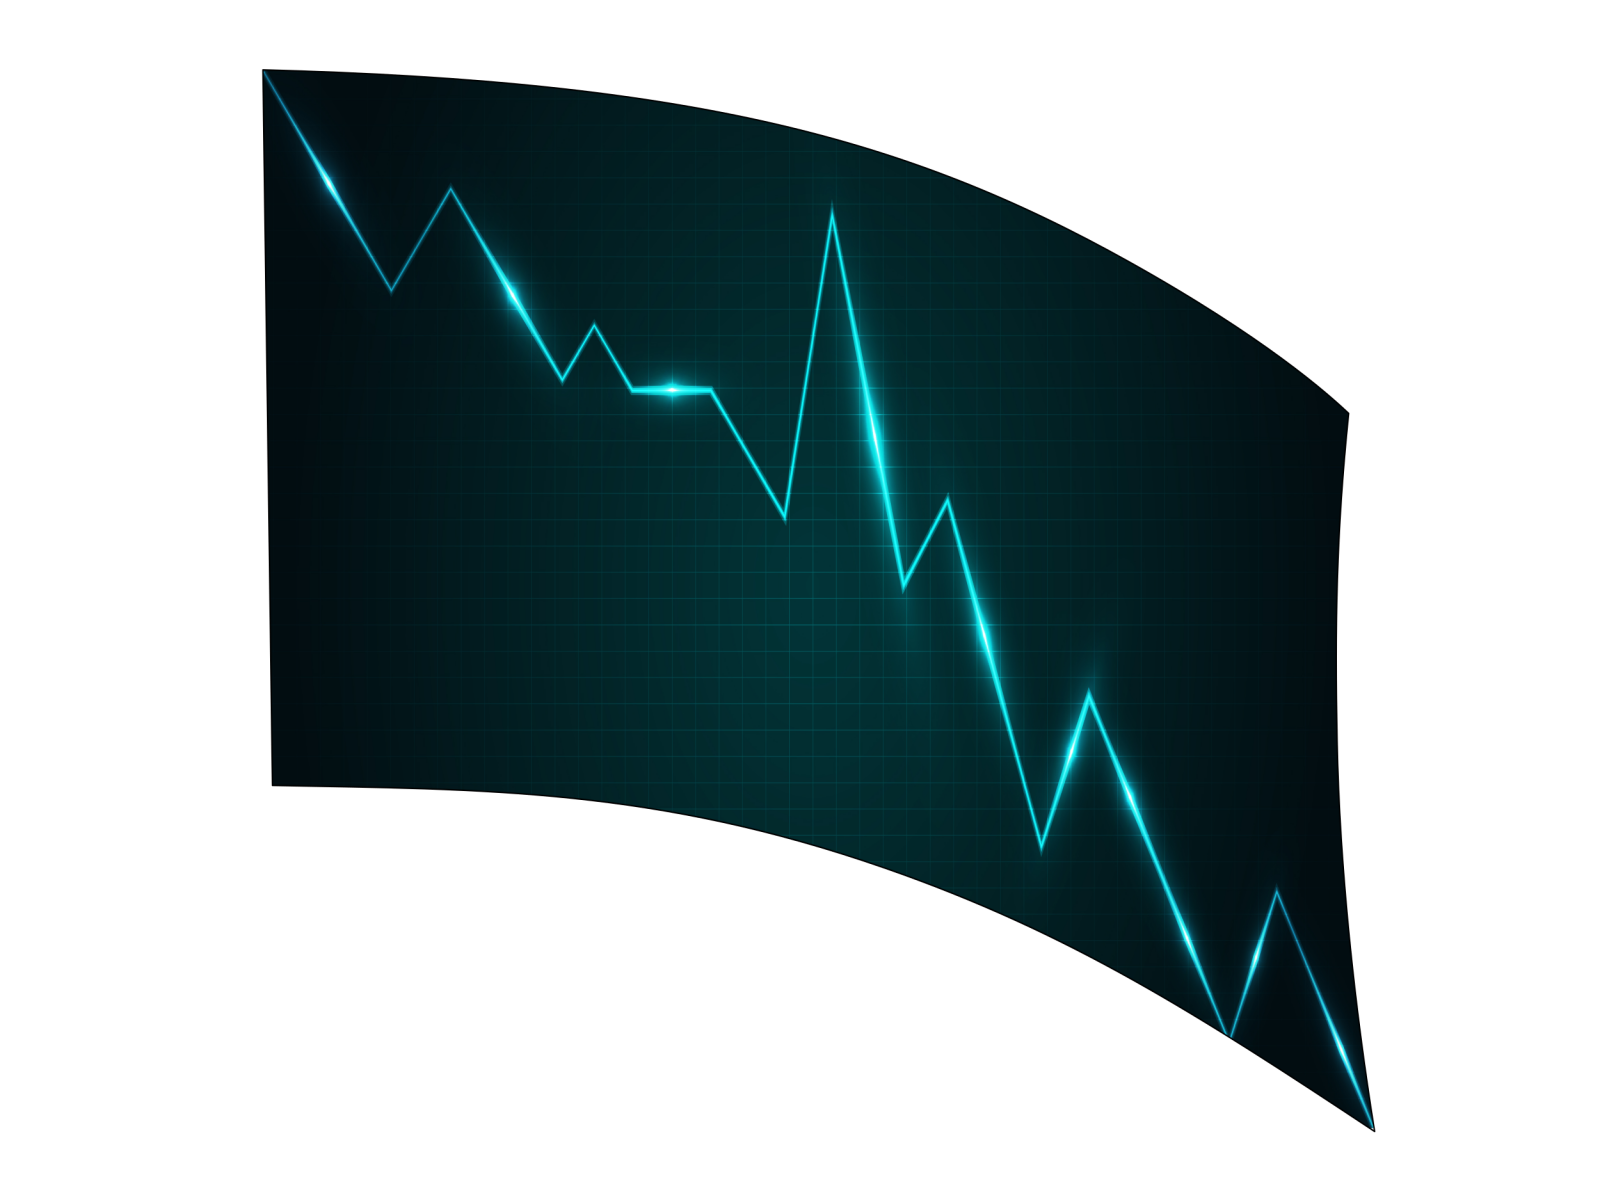 061101s - 36x52 Standard Stock Market Graph